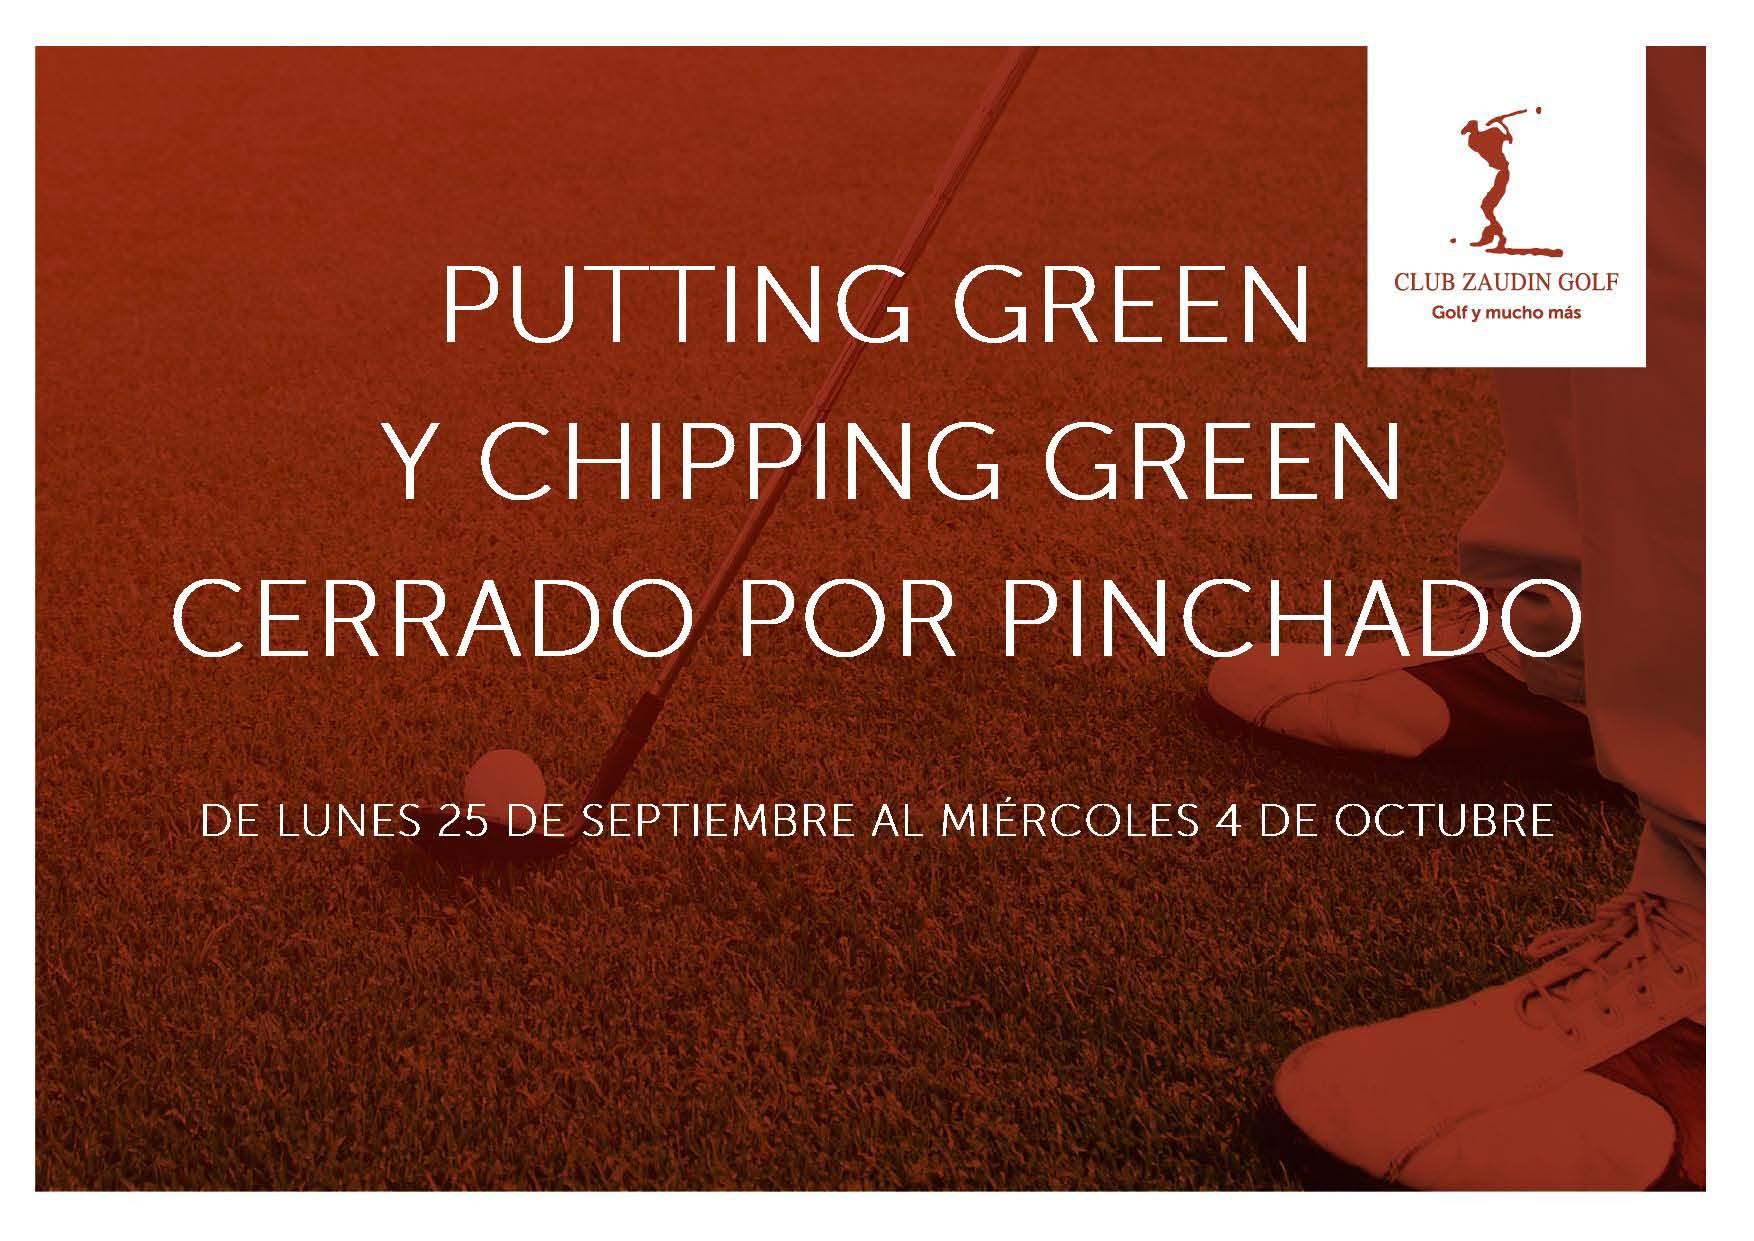 Pinchado Putting Green y Chipping Green